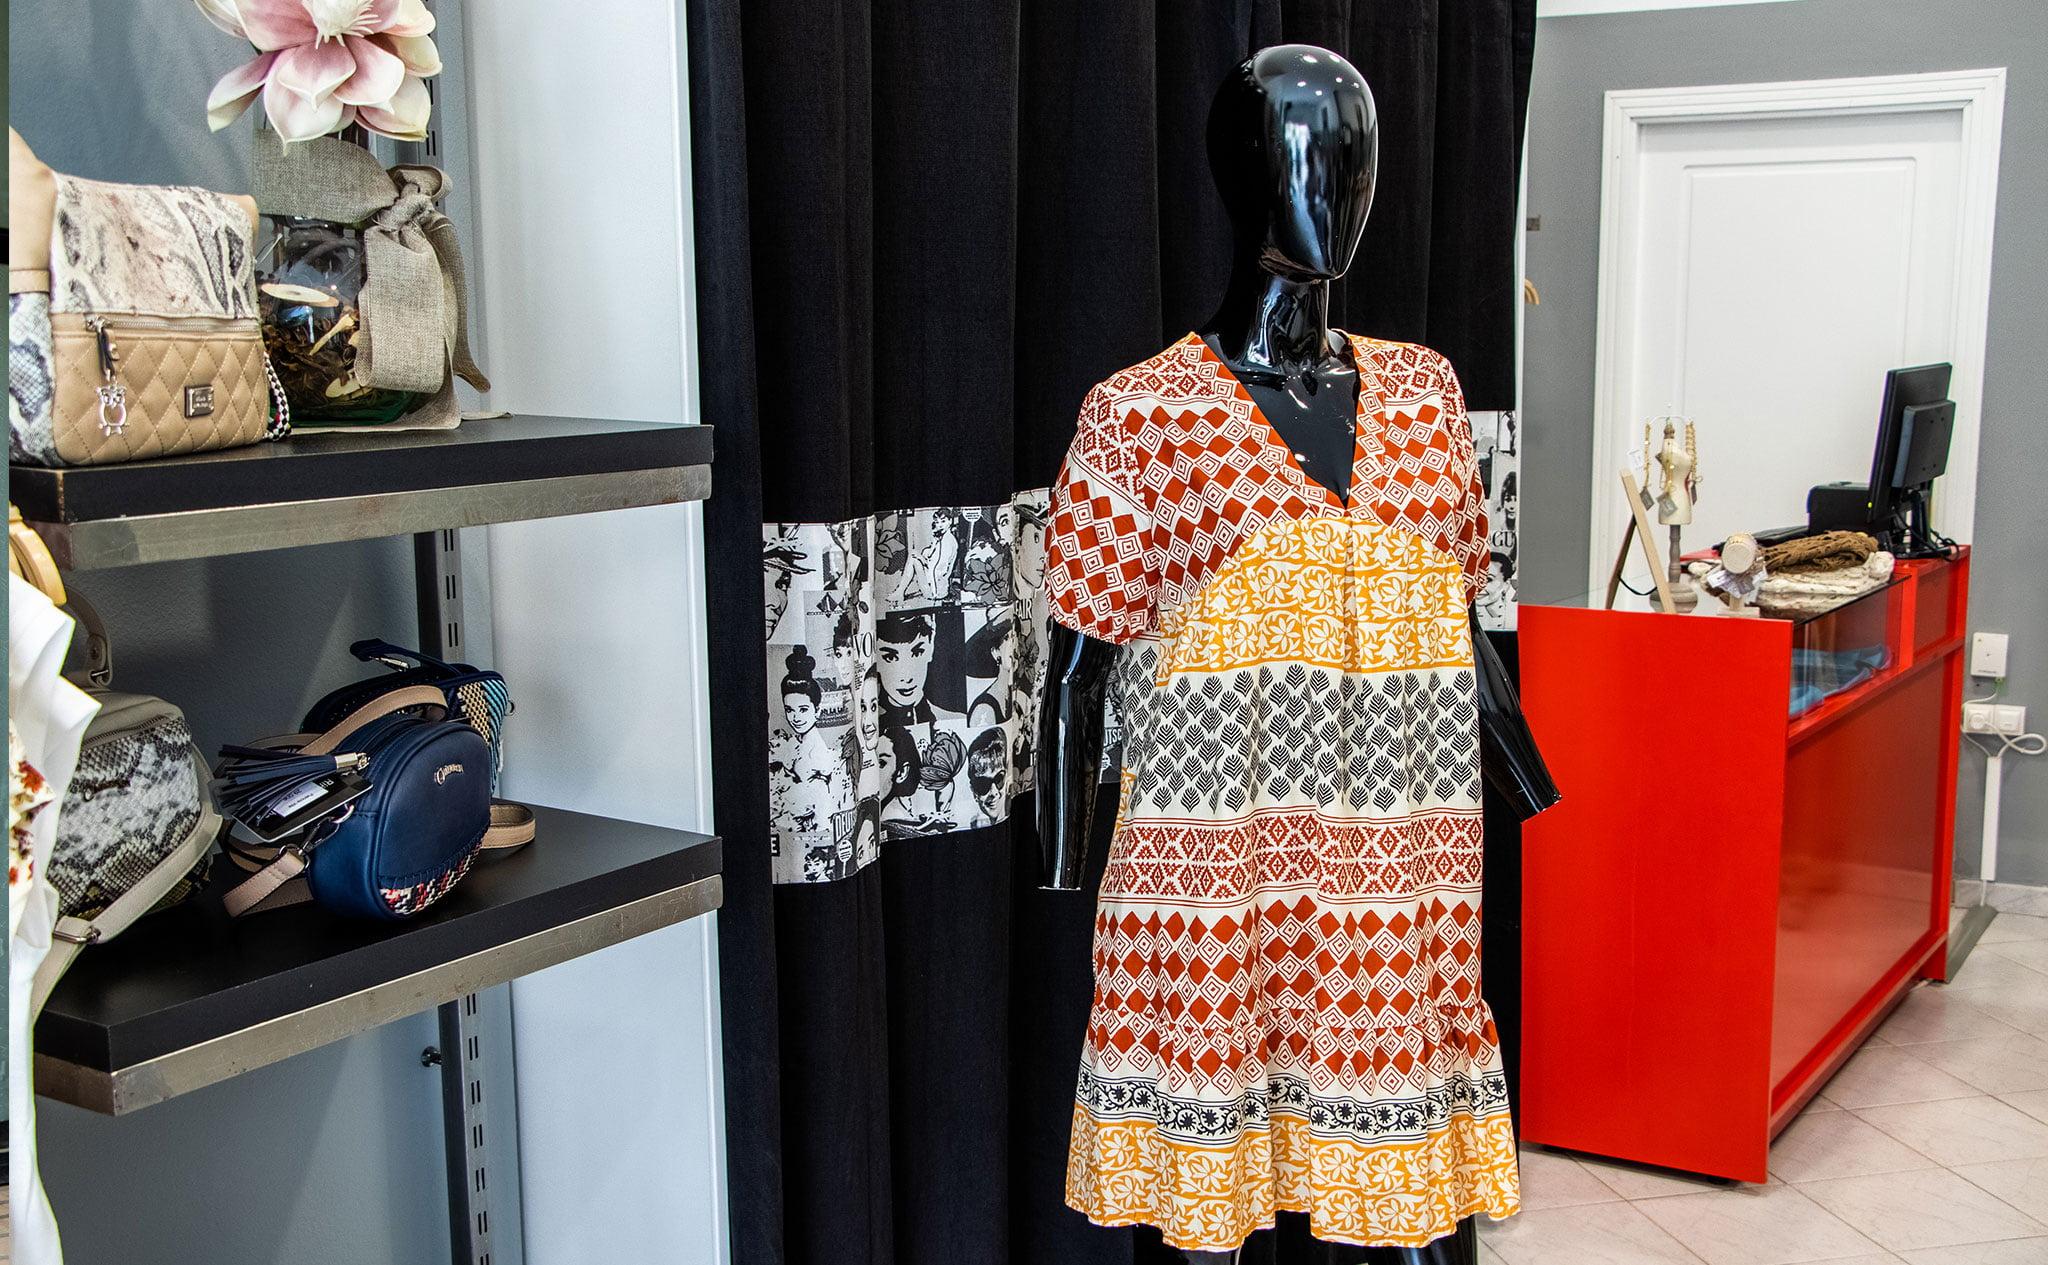 Dónde comprar ropa en Dénia – Patricia Vila